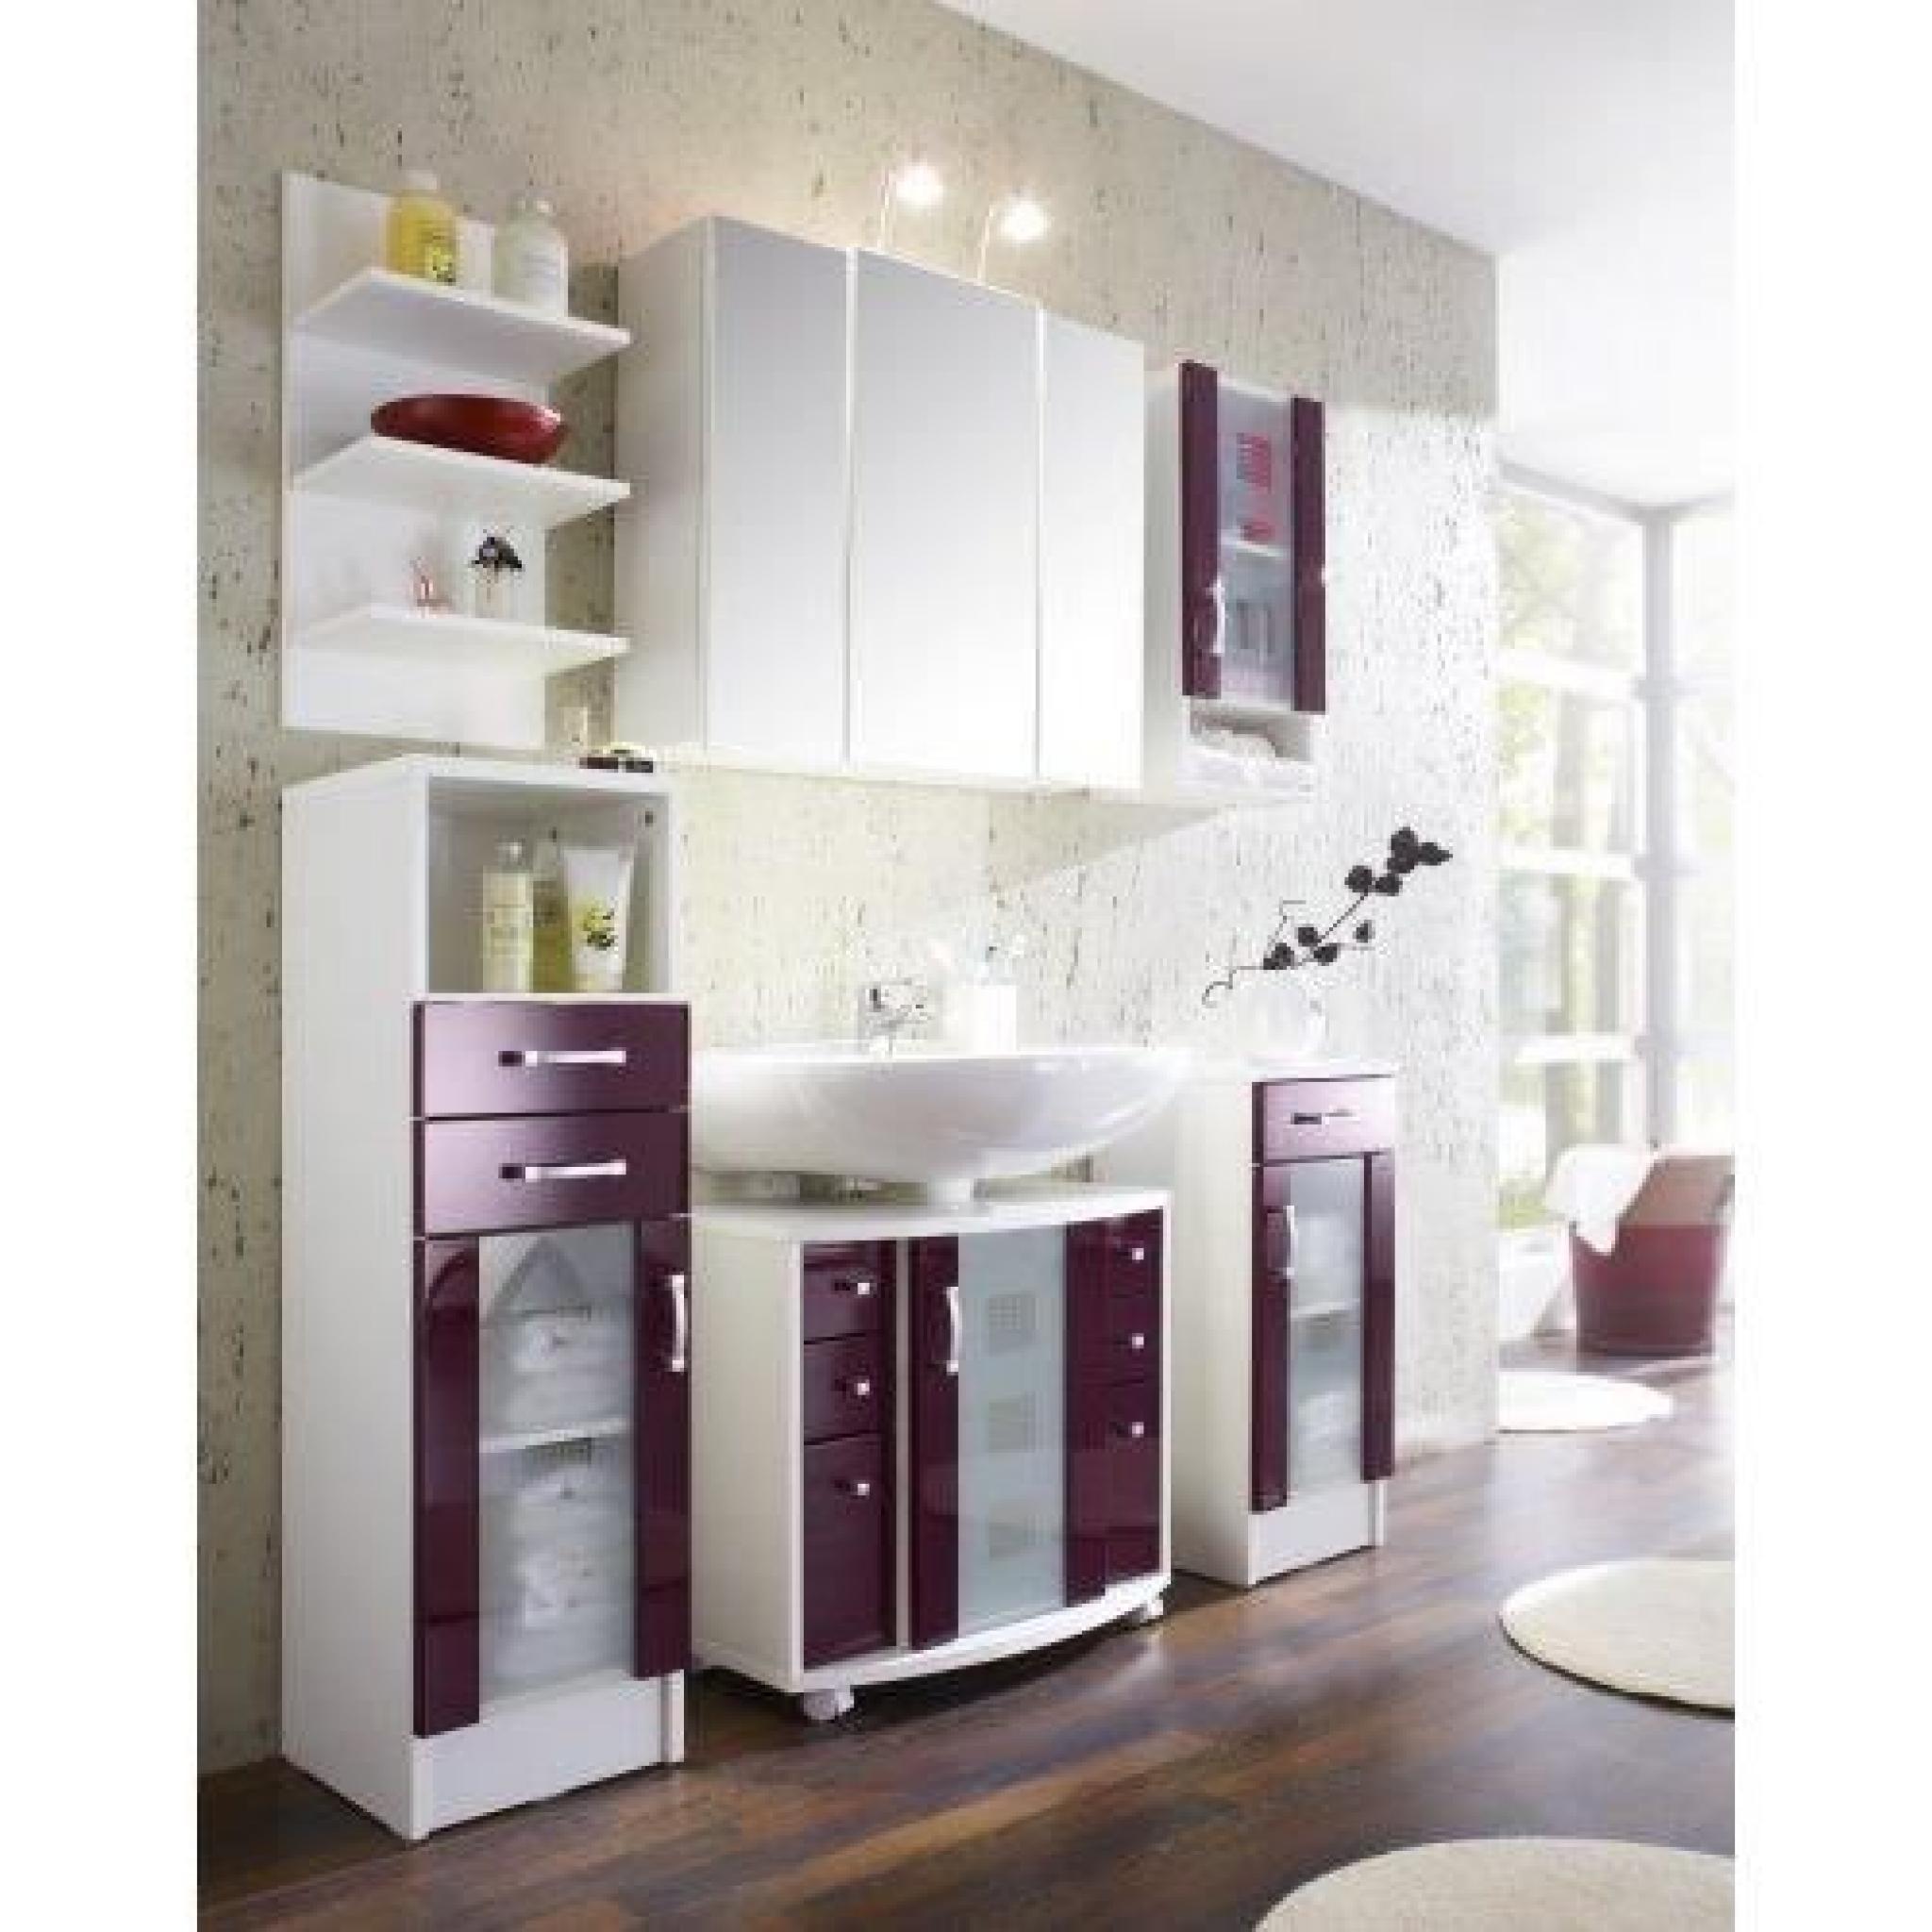 Posseik 5404 89 armoire suspendue nizza nizas m re brillant blanc achat vente armoire de - Armoire suspendue chambre ...